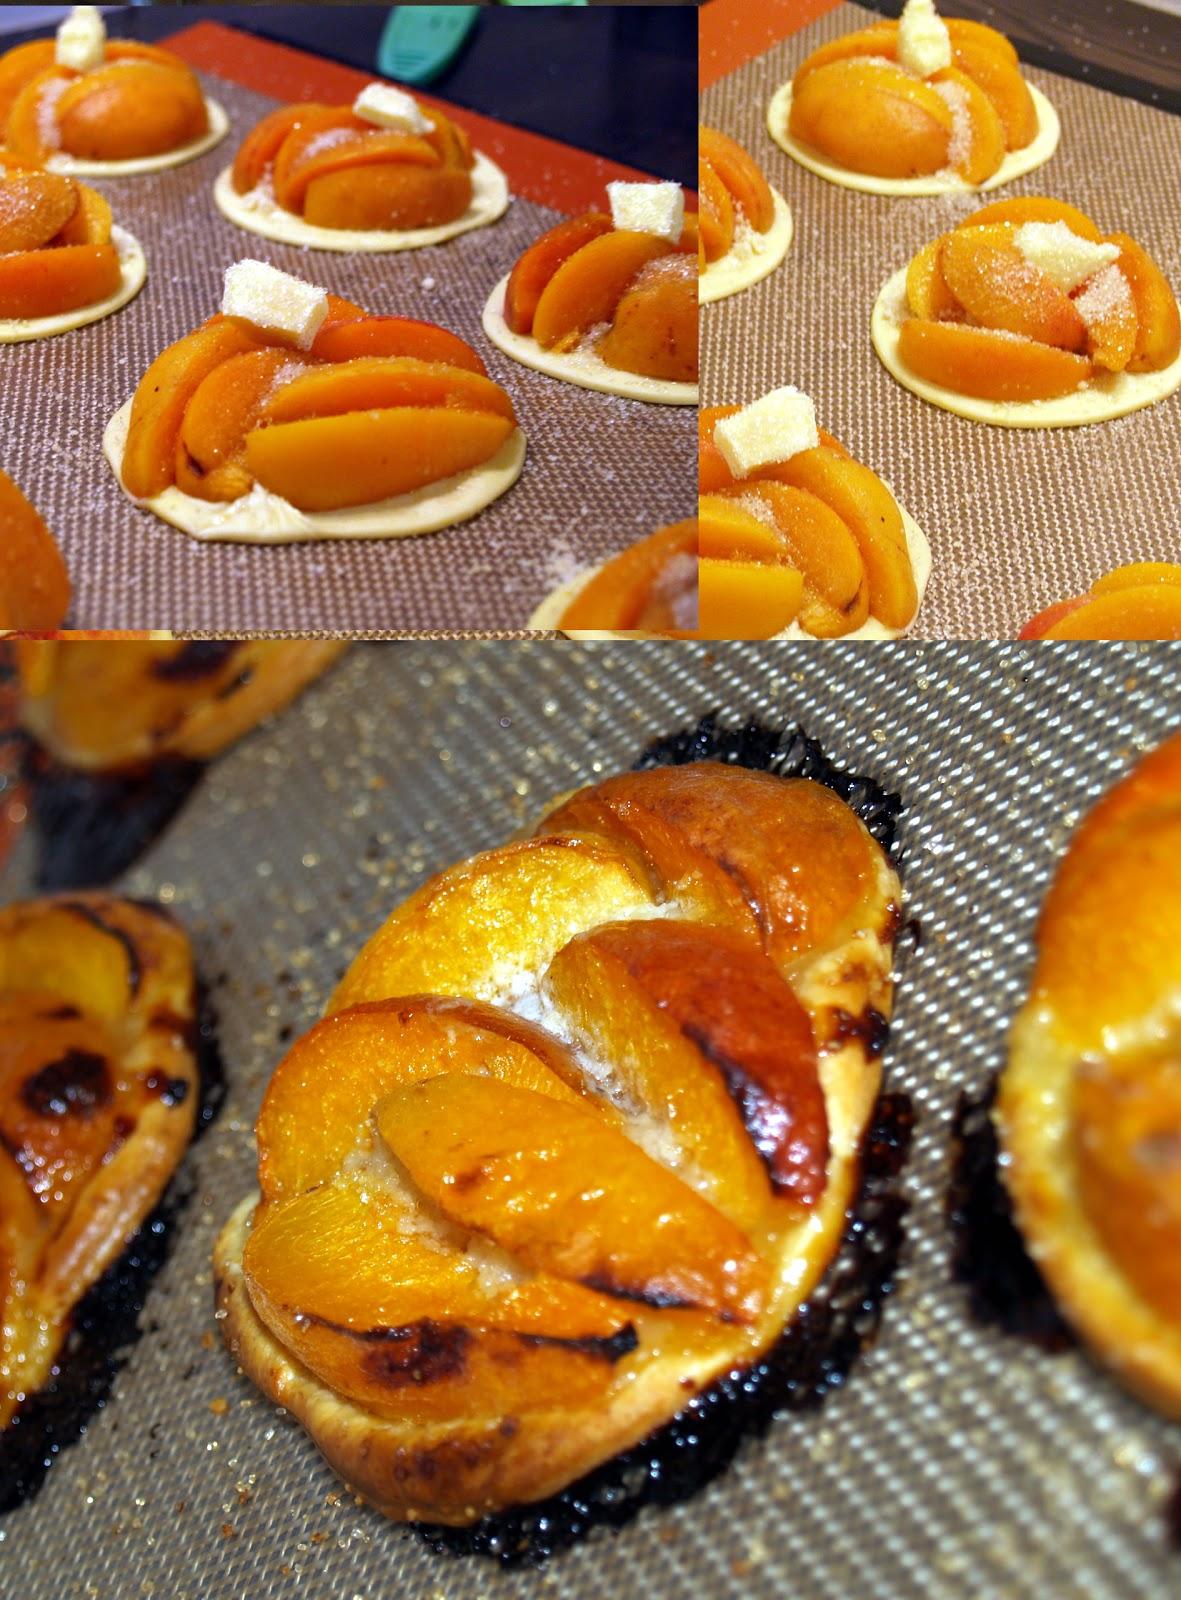 bamby cuisine tarte fine aux abricots. Black Bedroom Furniture Sets. Home Design Ideas